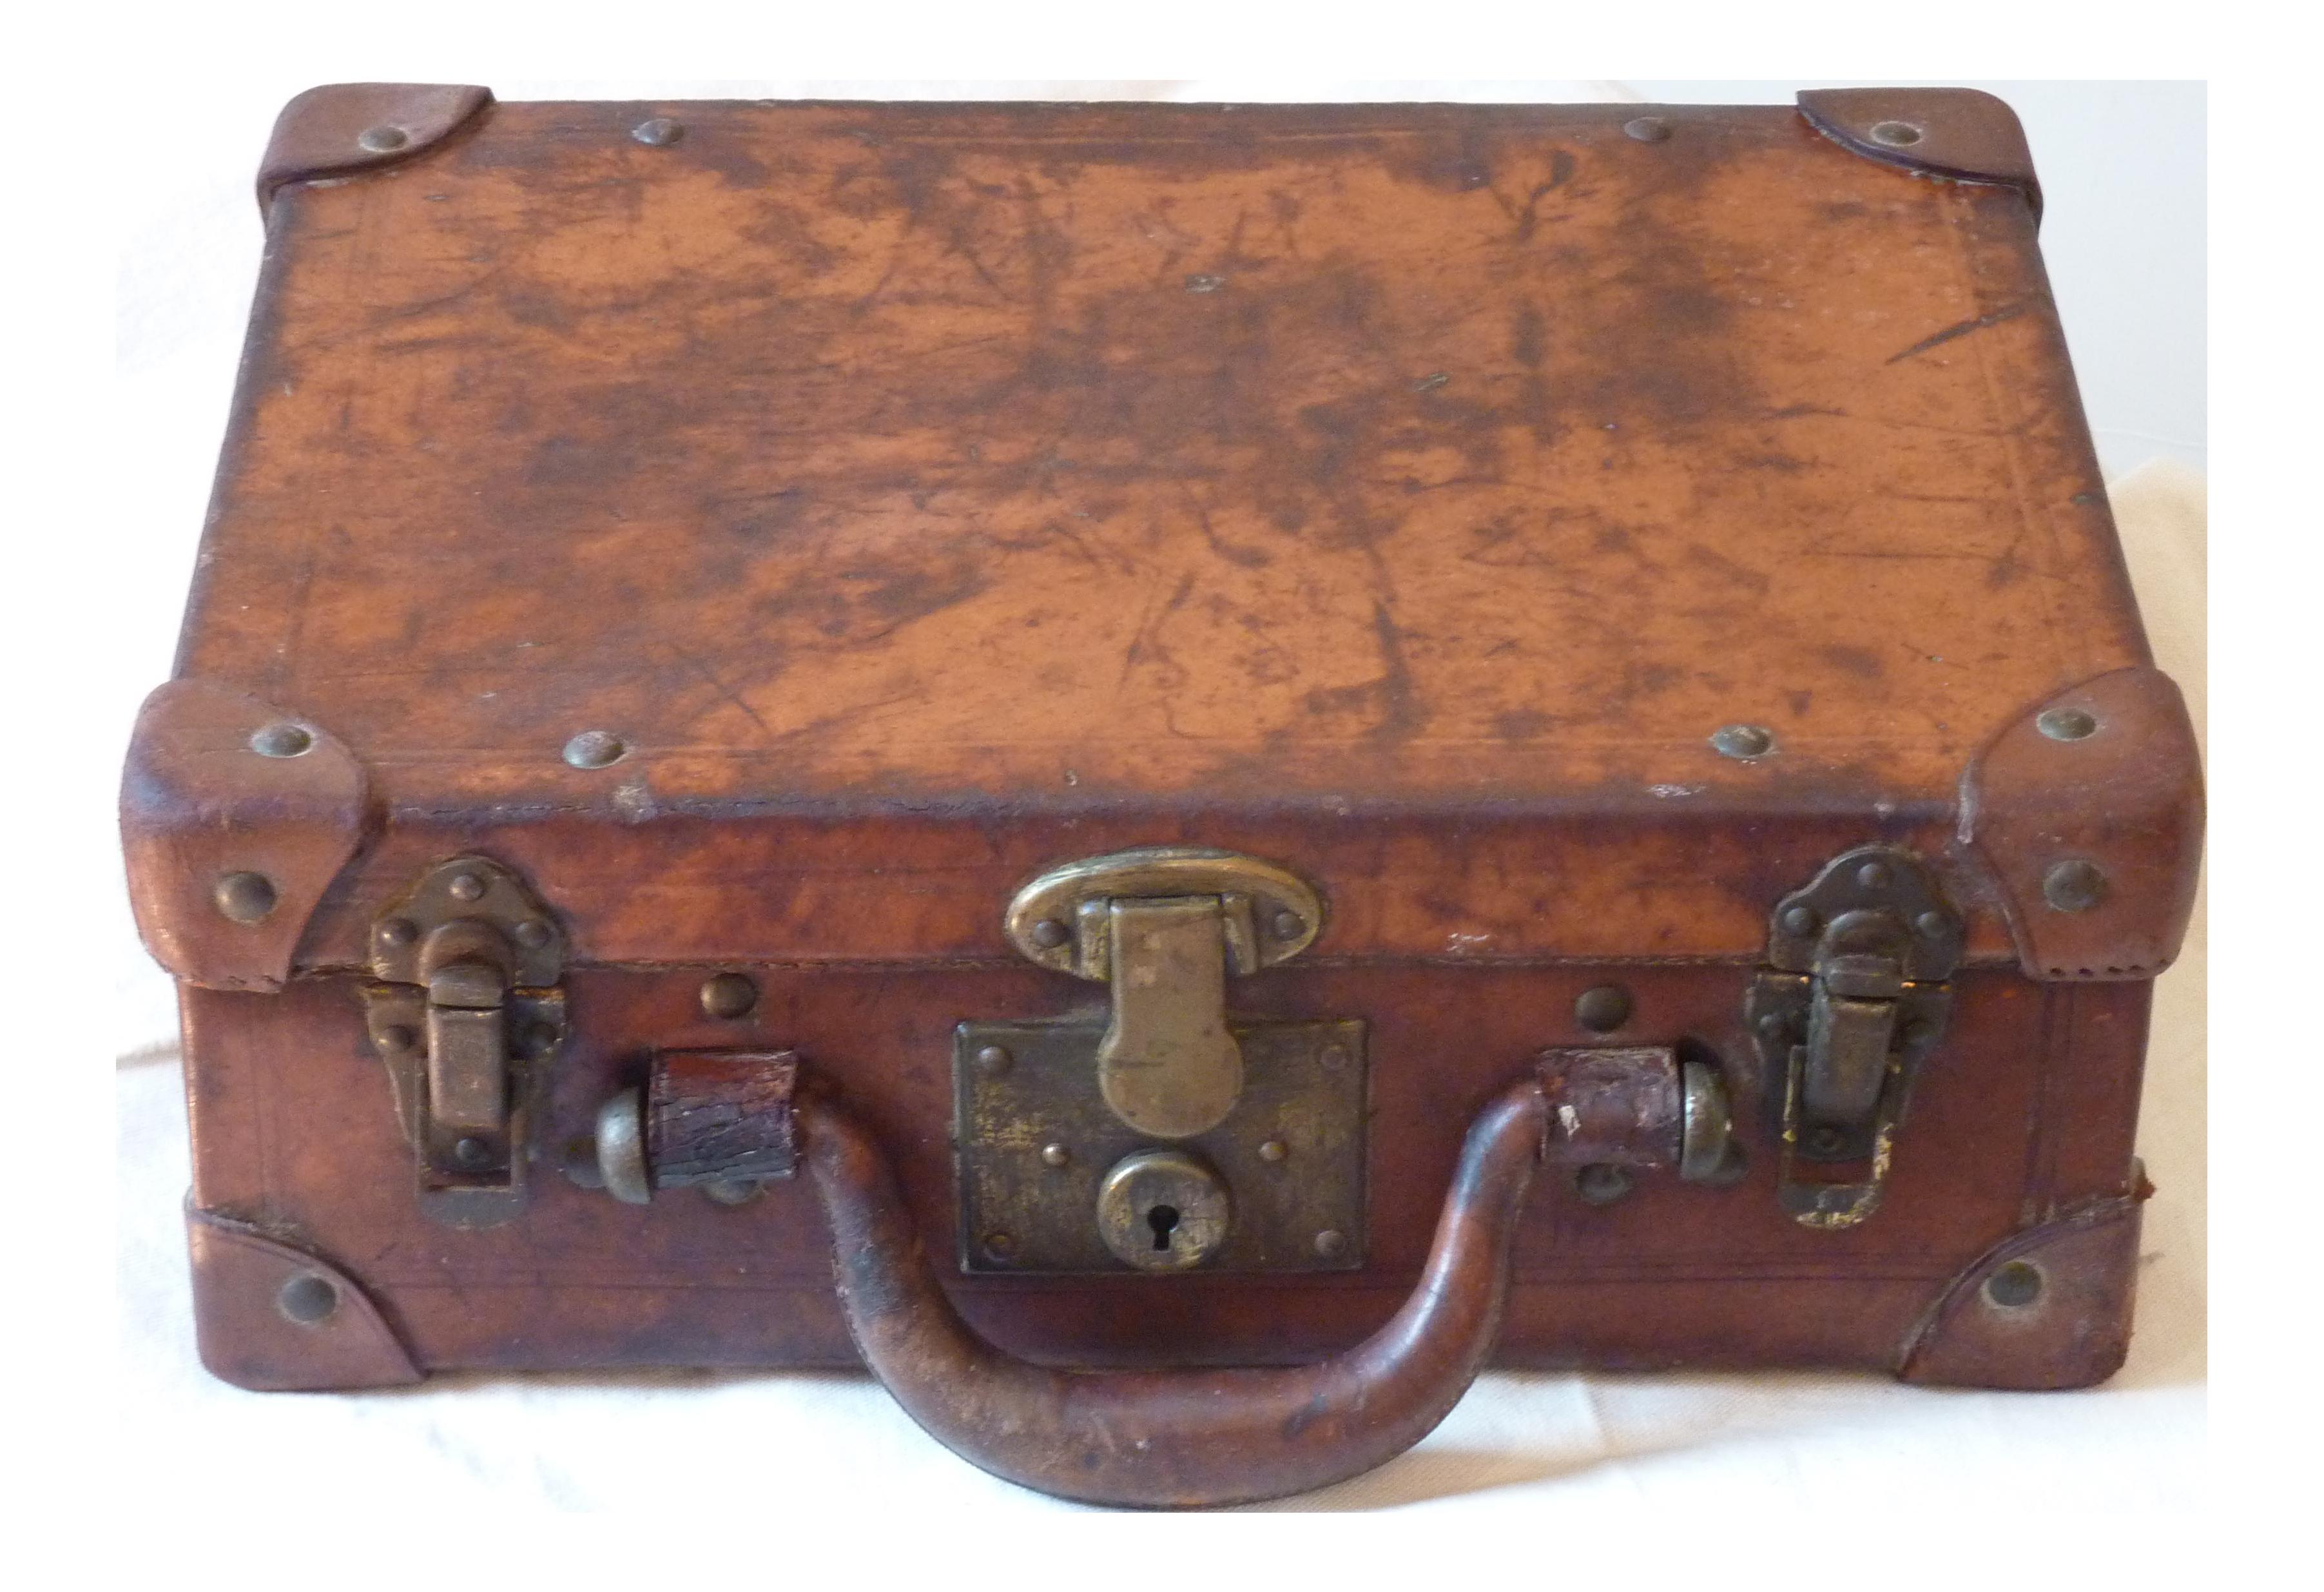 Vintage & Used Leather Luggage | Chairish